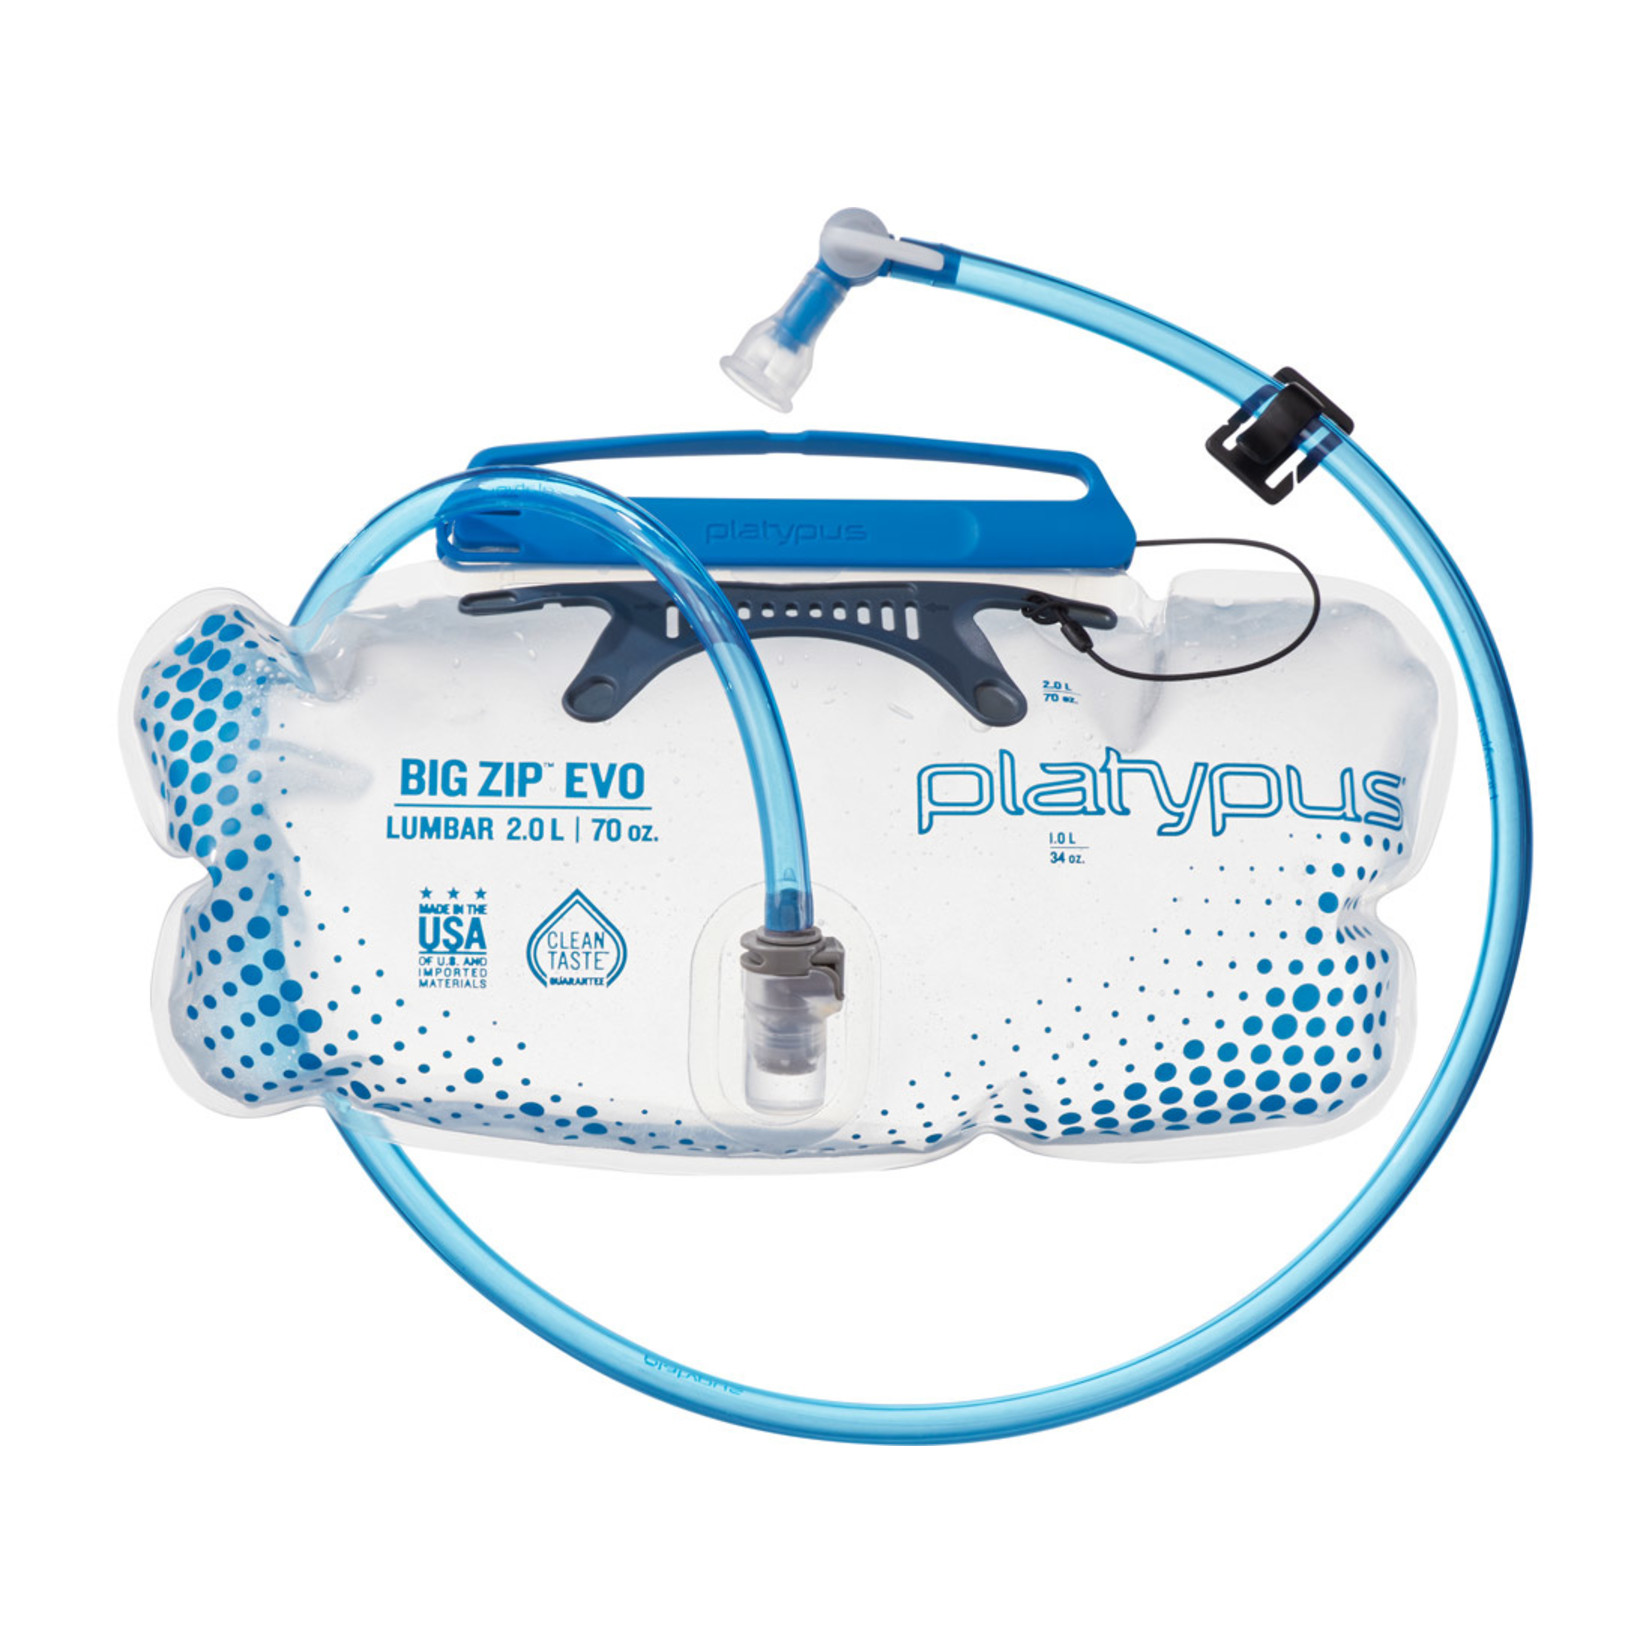 Platypus Big Zip™ EVO